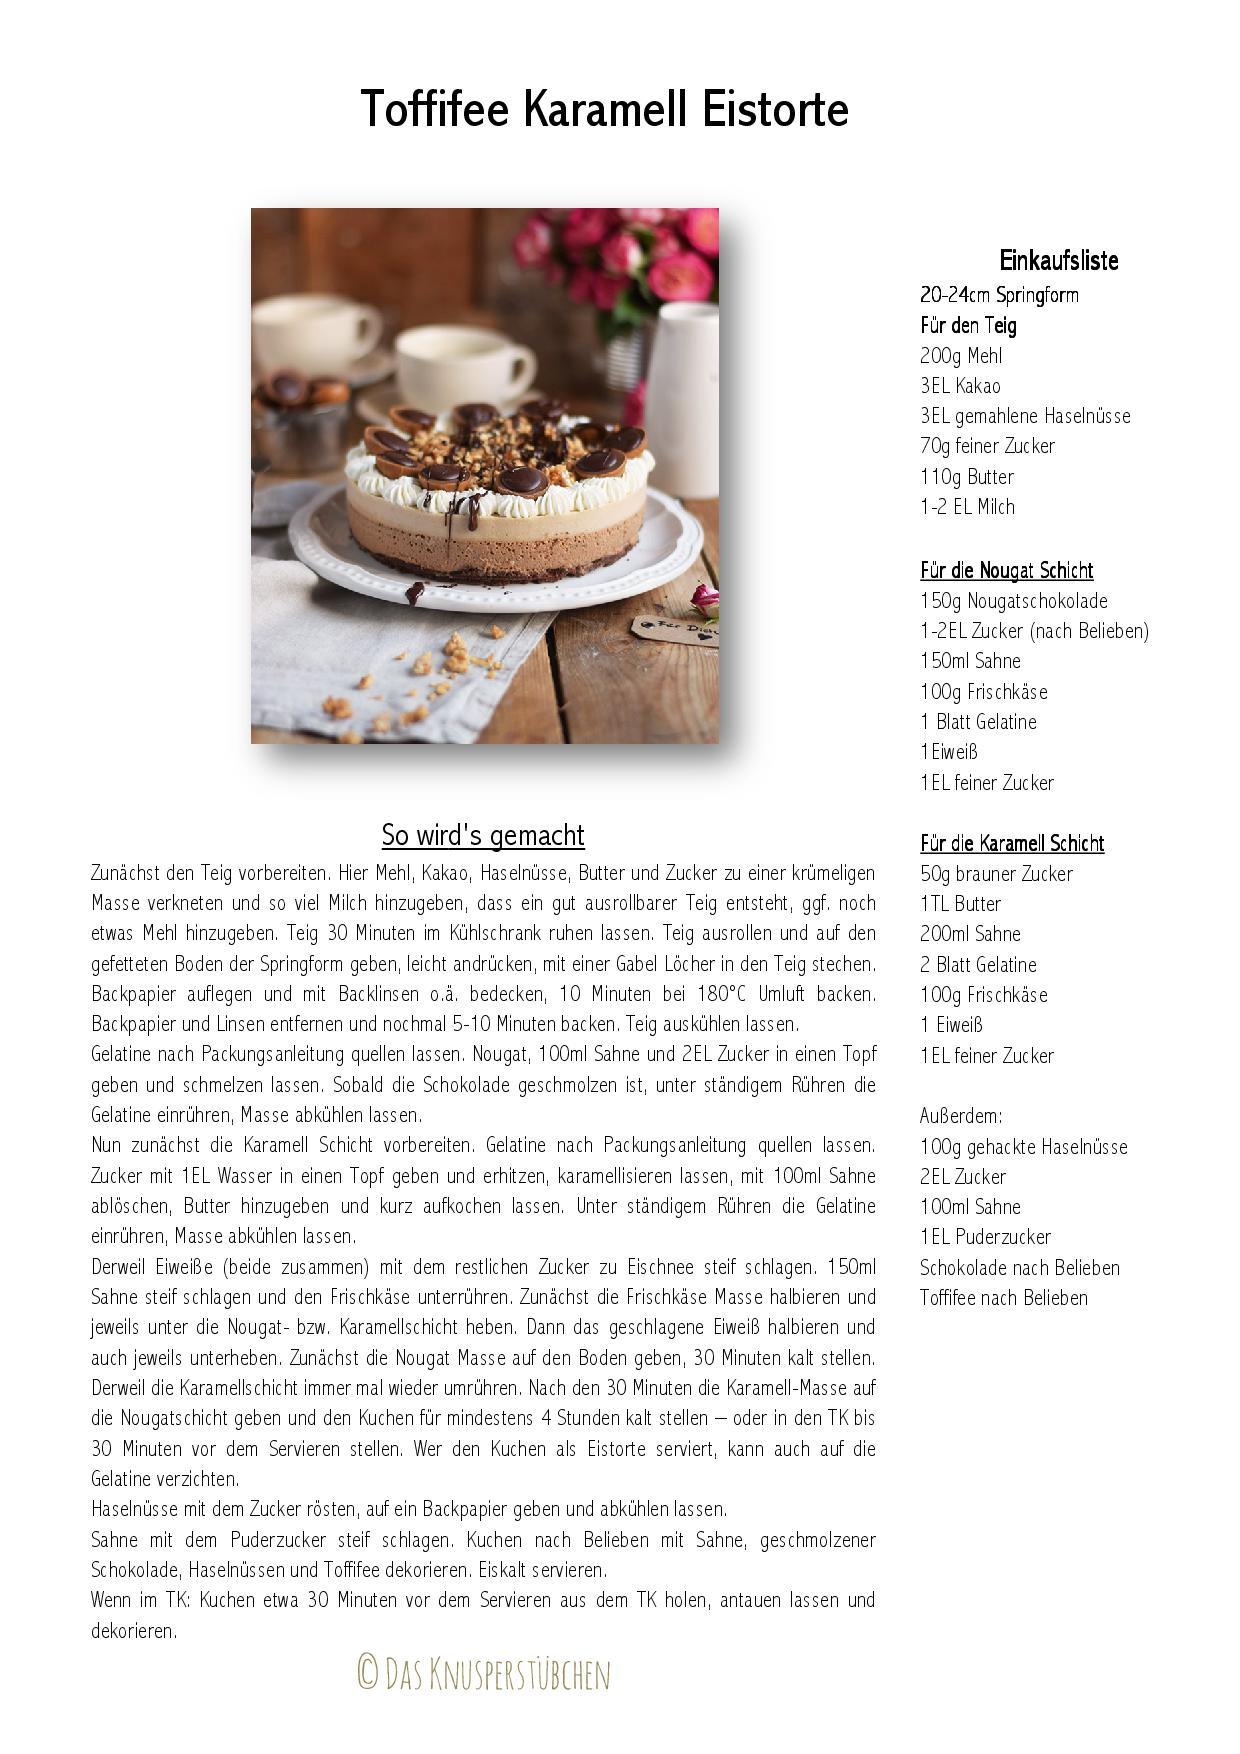 Toffifee Karamell Kuchen Ice Cream Cake-001